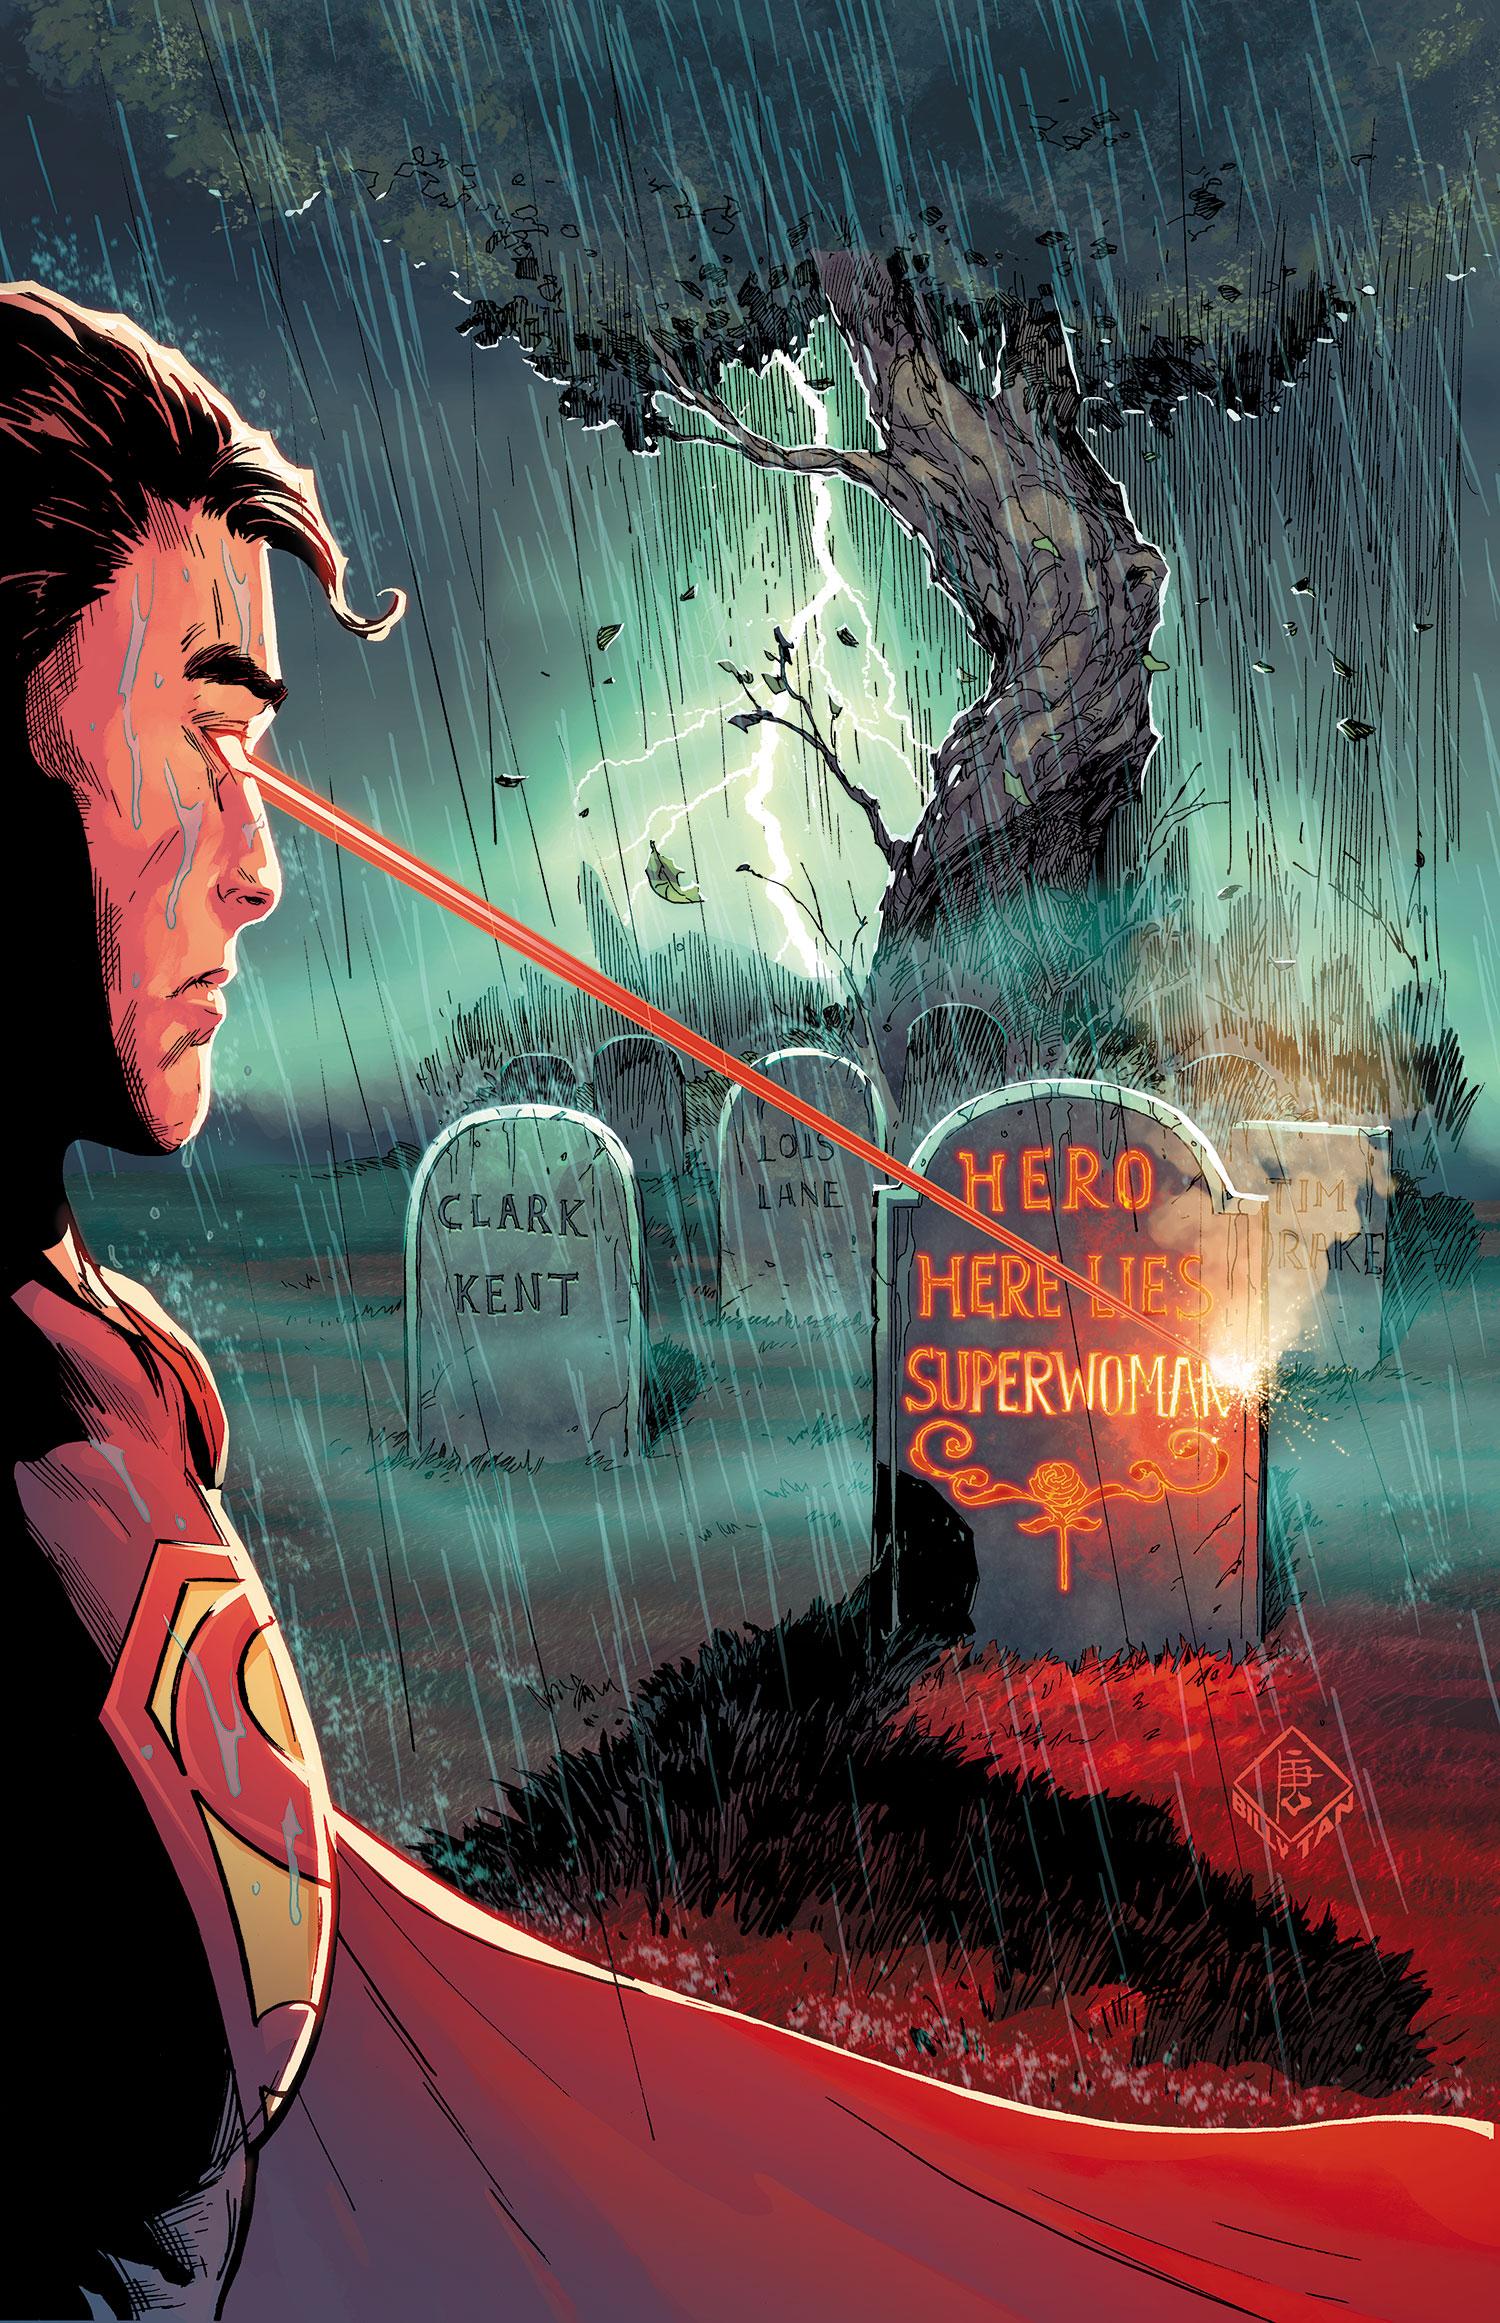 Superwoman Vol 1 9 Textless.jpg